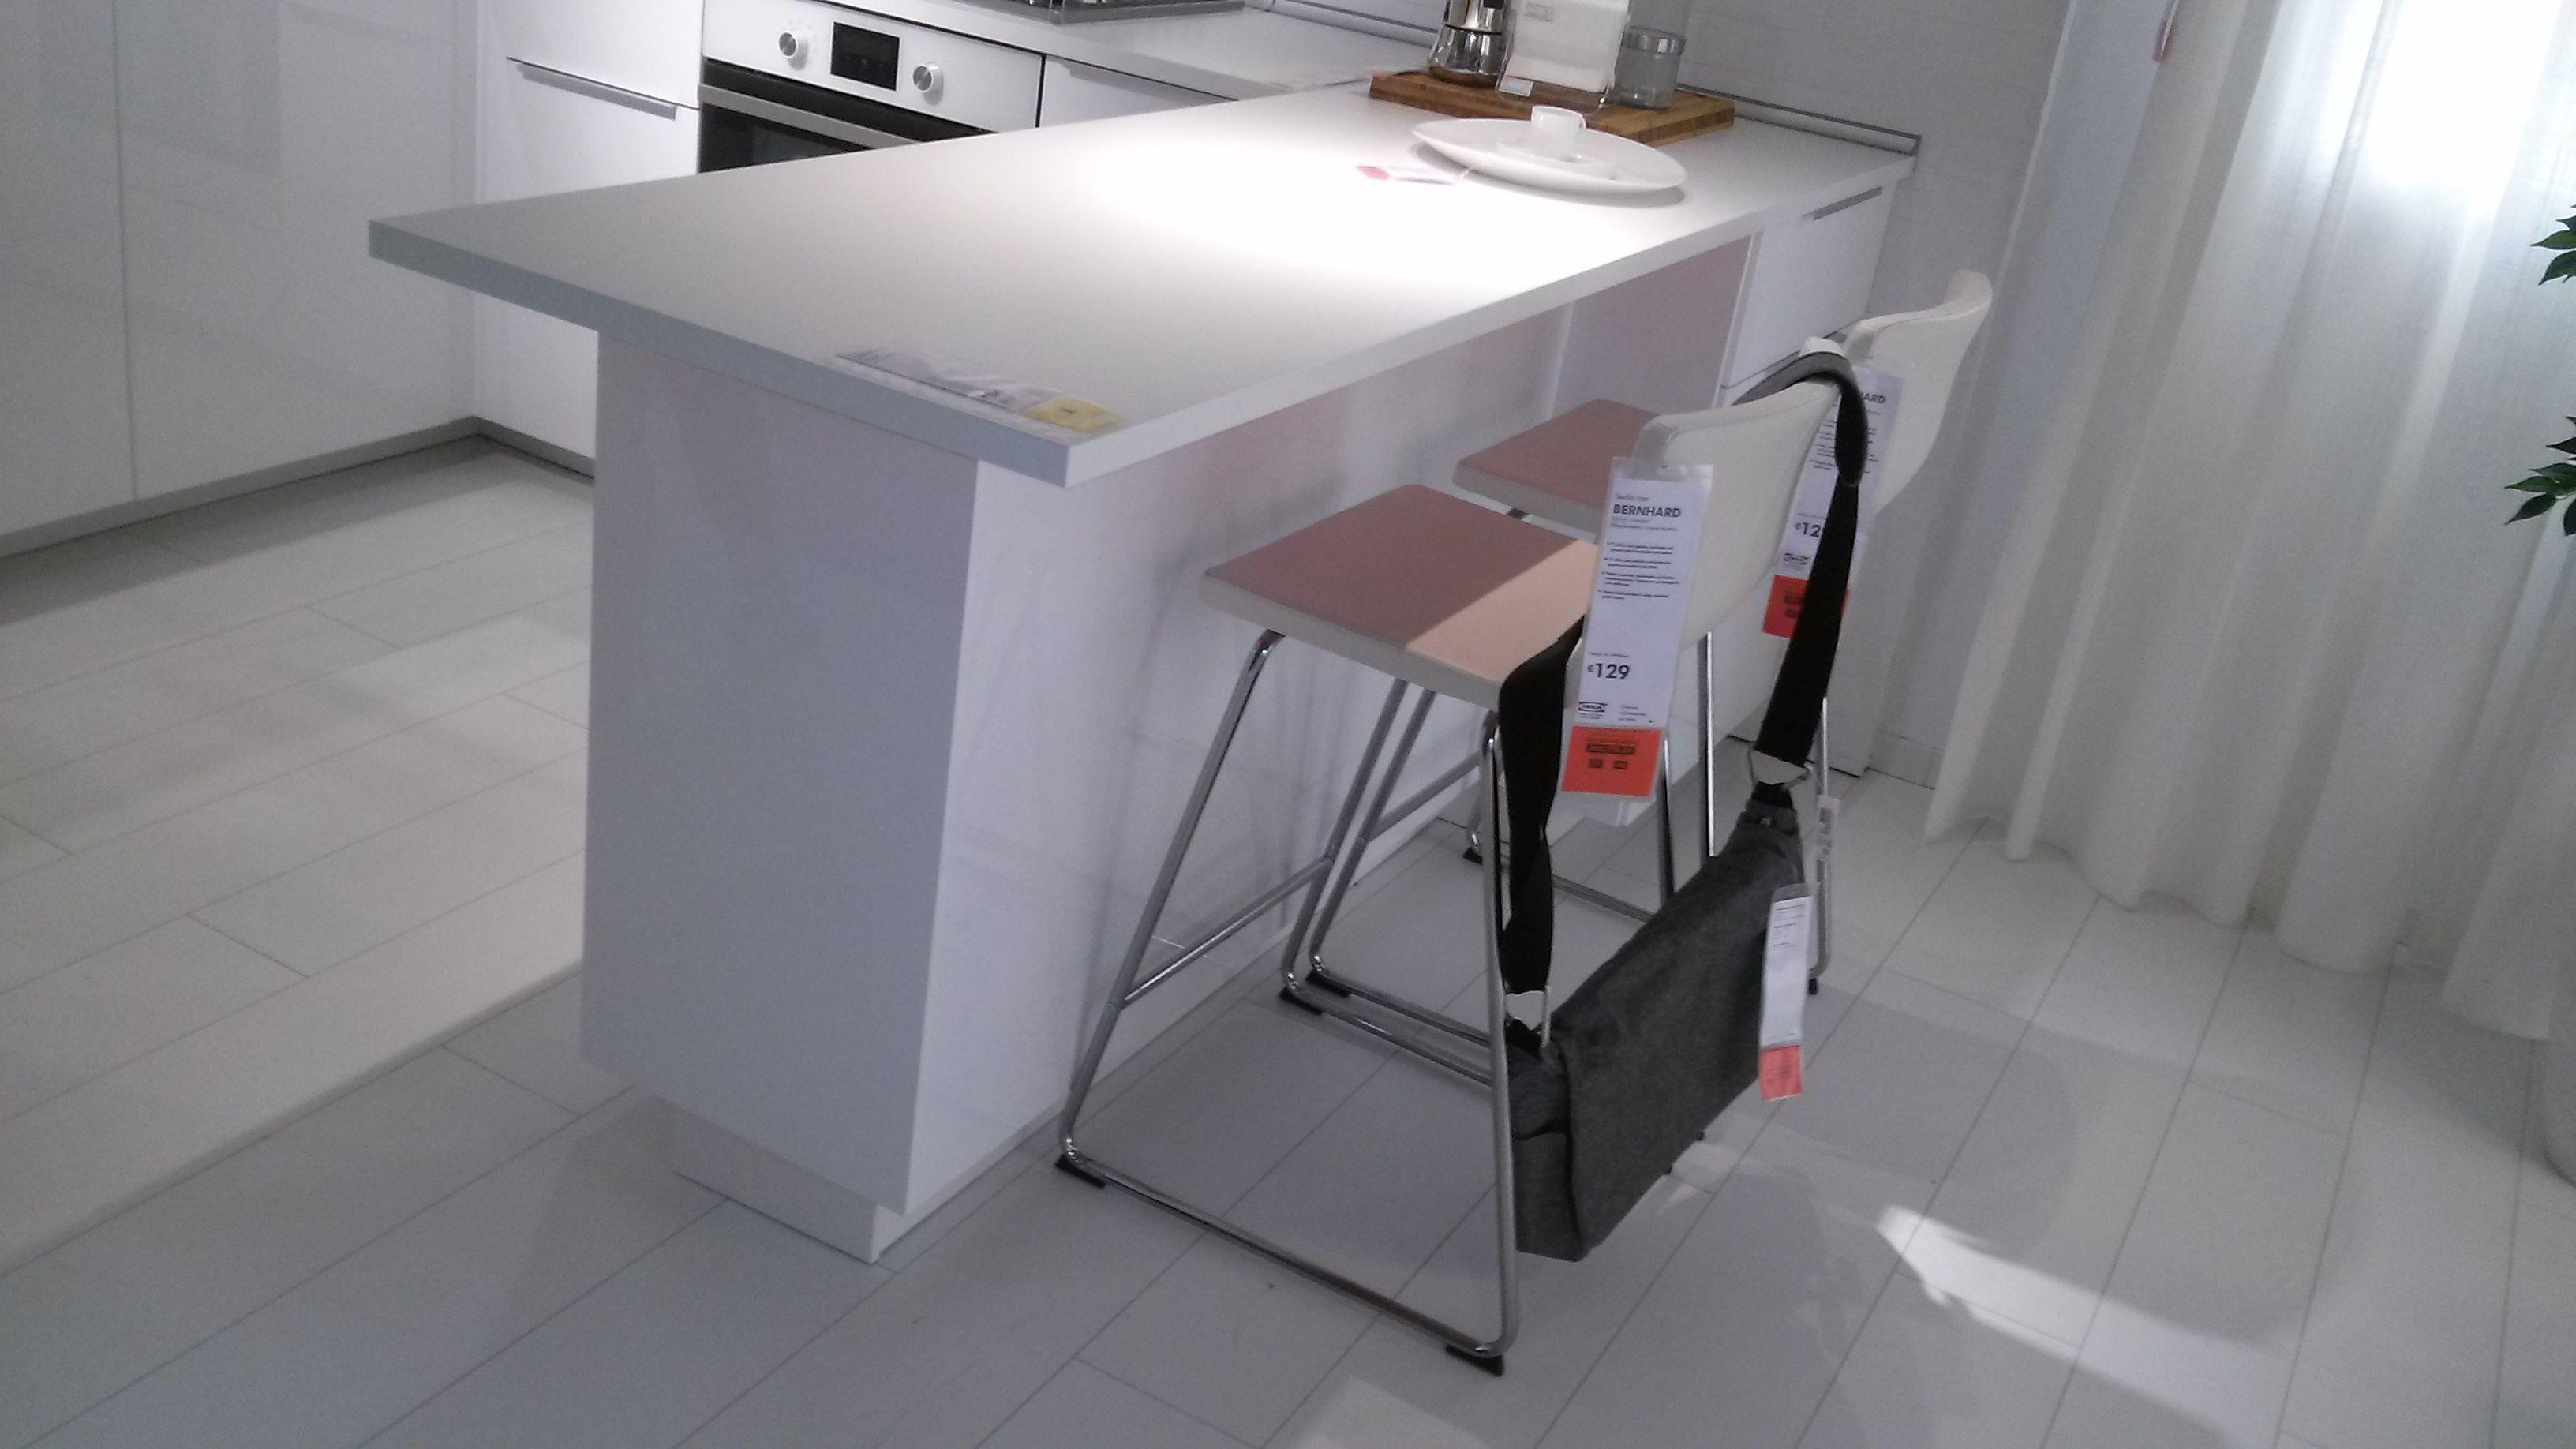 Ikea Ekbacken Fixa Shallow Cabinets Flat Decor Cabinet Island